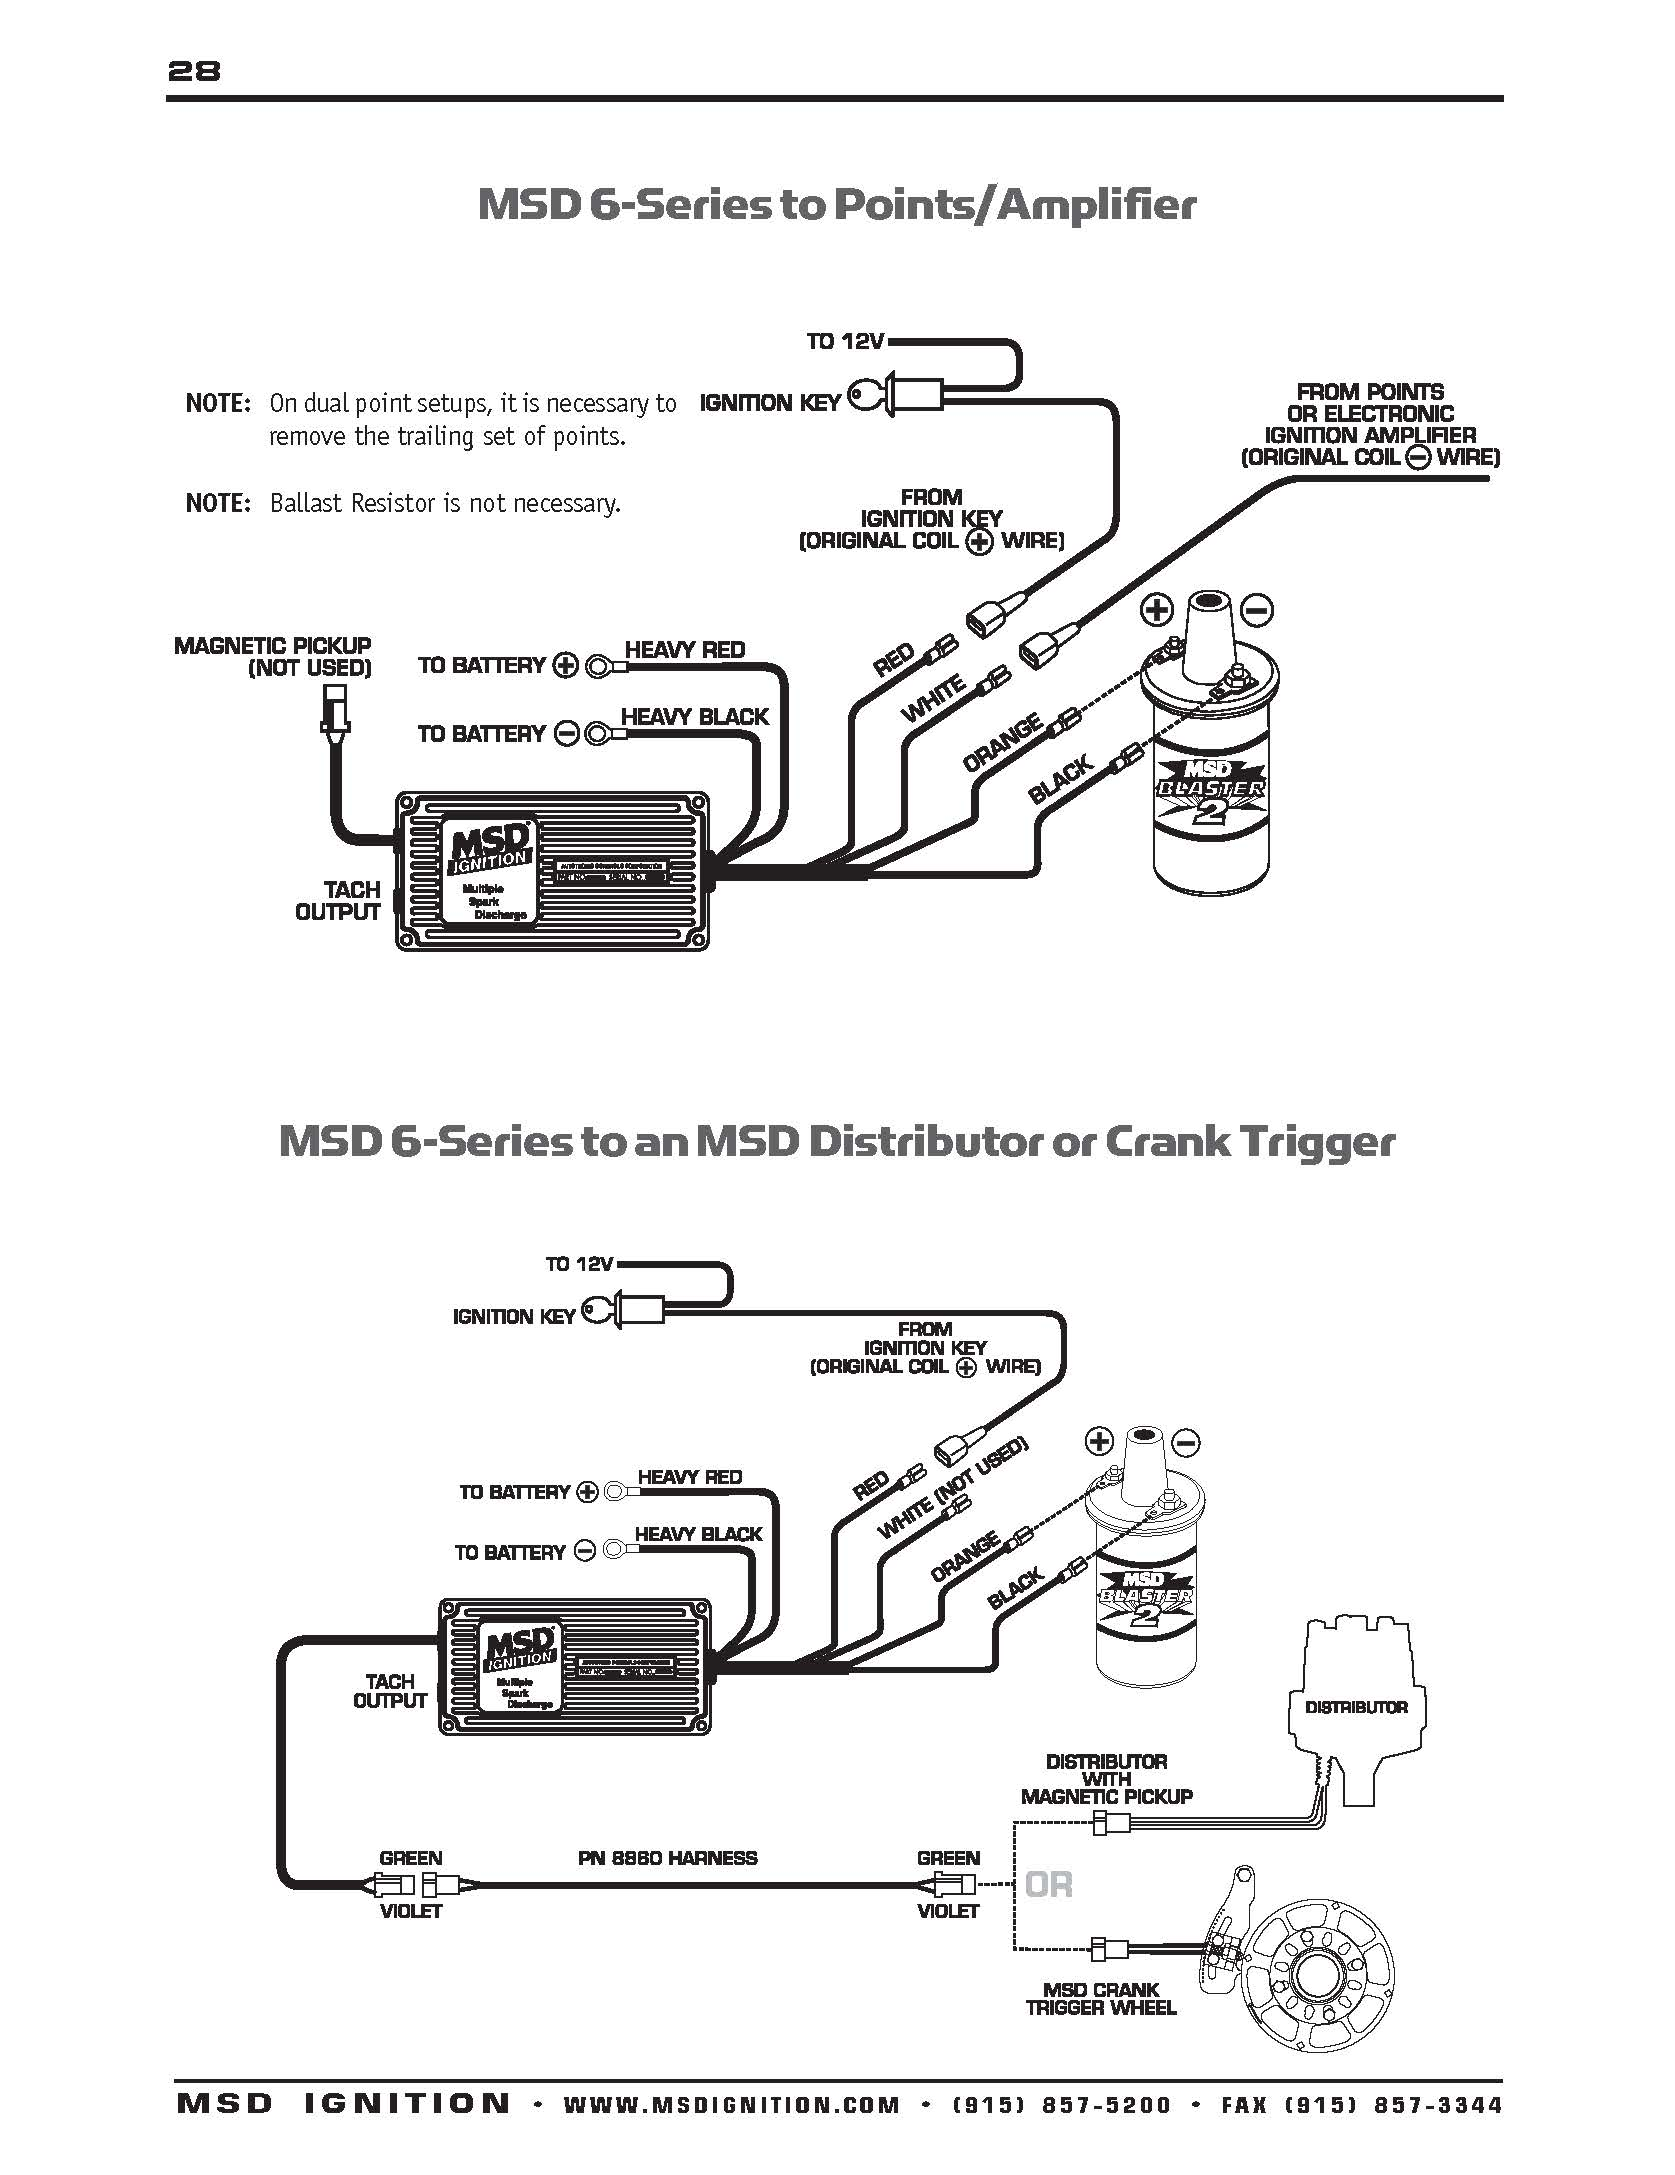 fh_0735] mallory ignition wiring diagram vw mk1 mallory ignition wiring diagram vw mk1 vw t25 fuse box diagram xtern meric piot gray stre joami xaem scata norab wiluq sequ ...